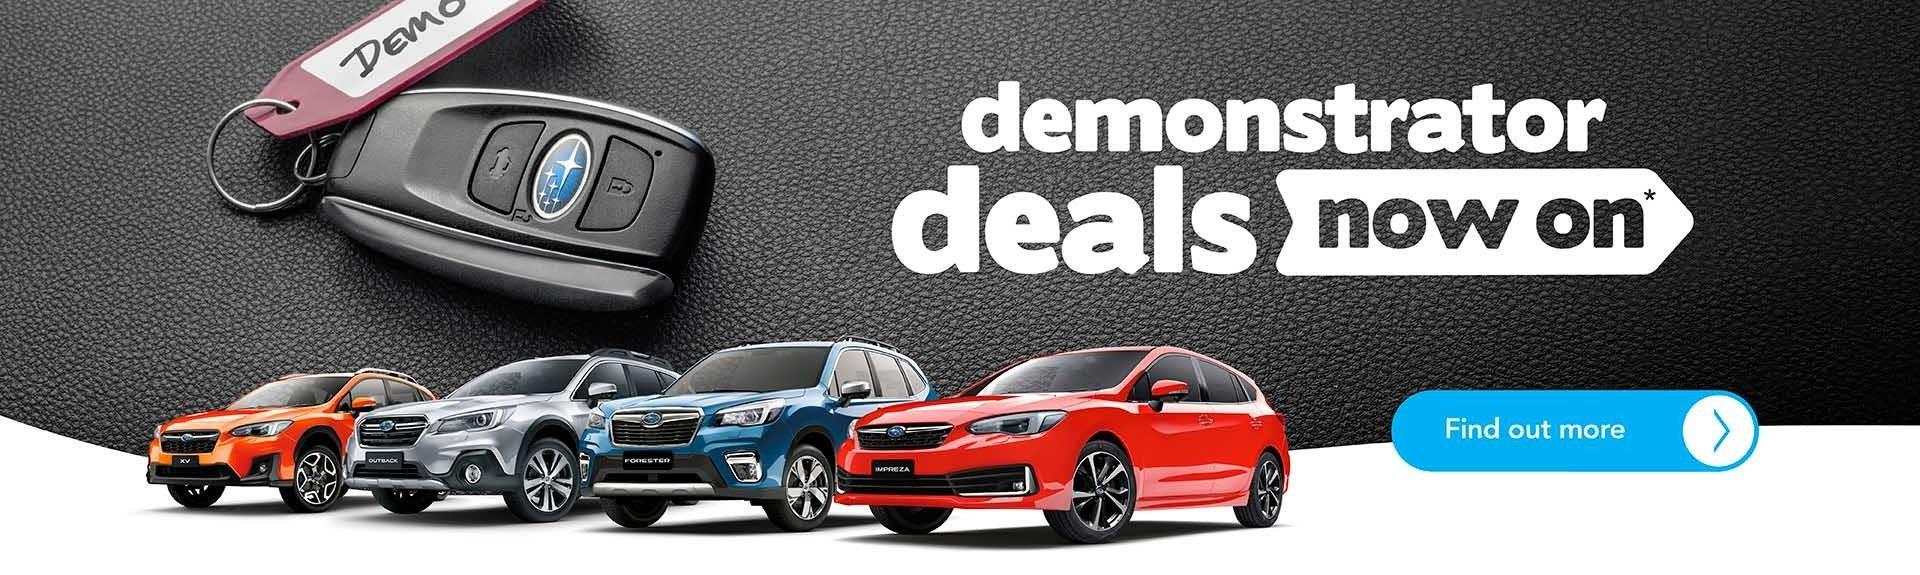 Subaru Doncaster - Demonstrator Sale on now